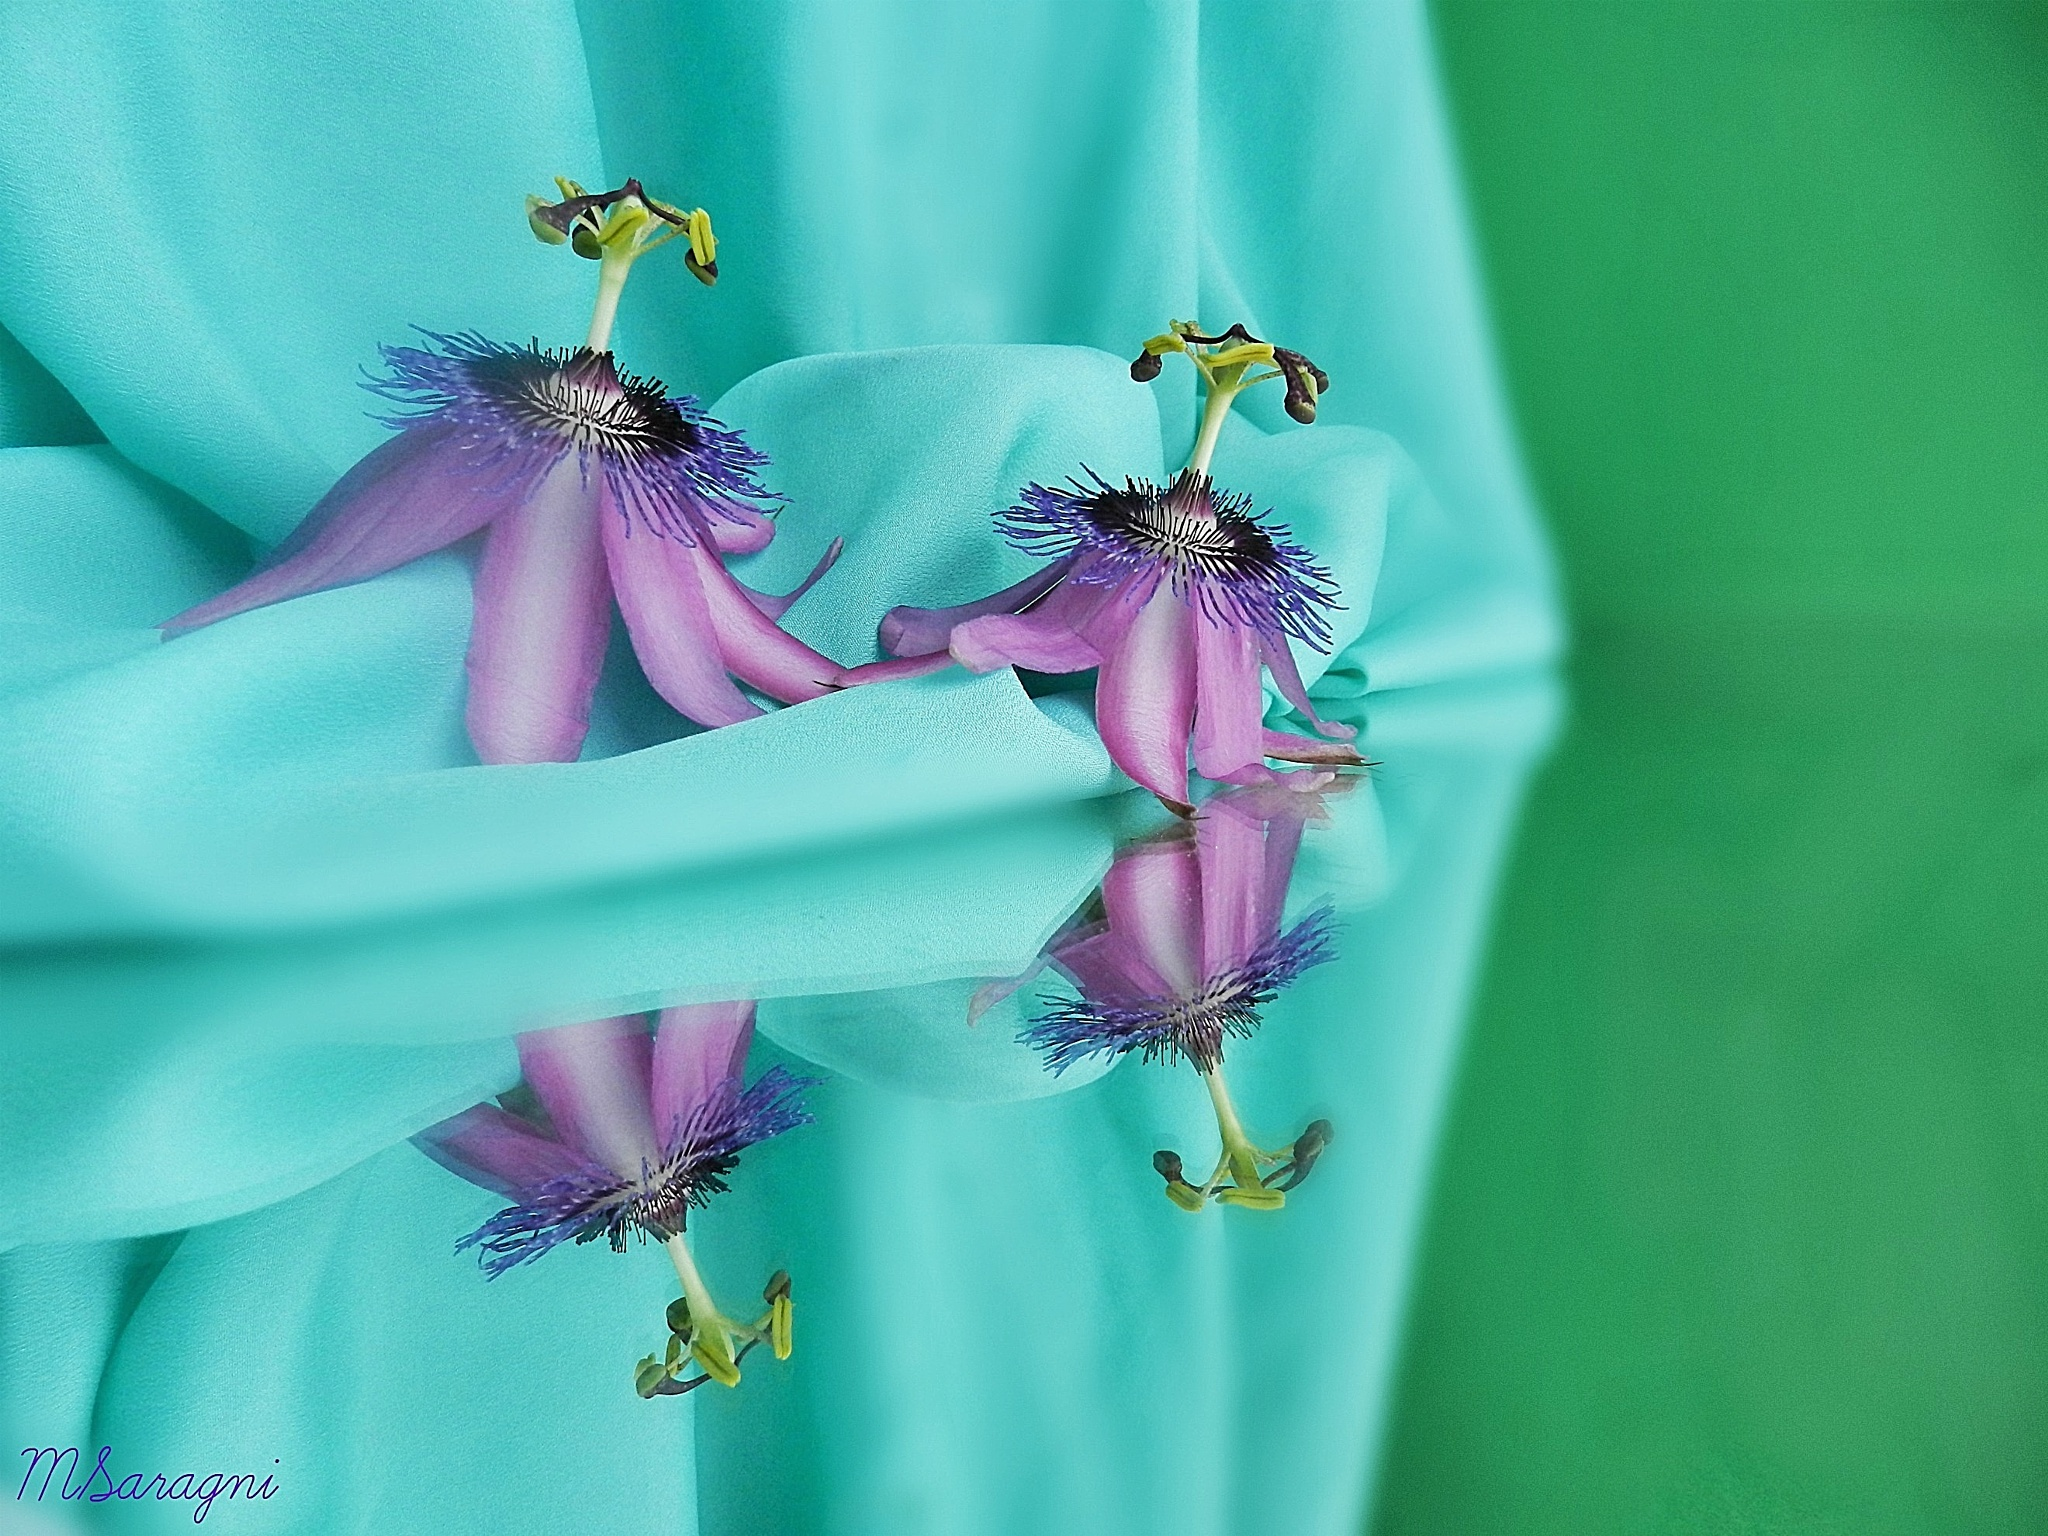 Passiflora by Marisa Saragni